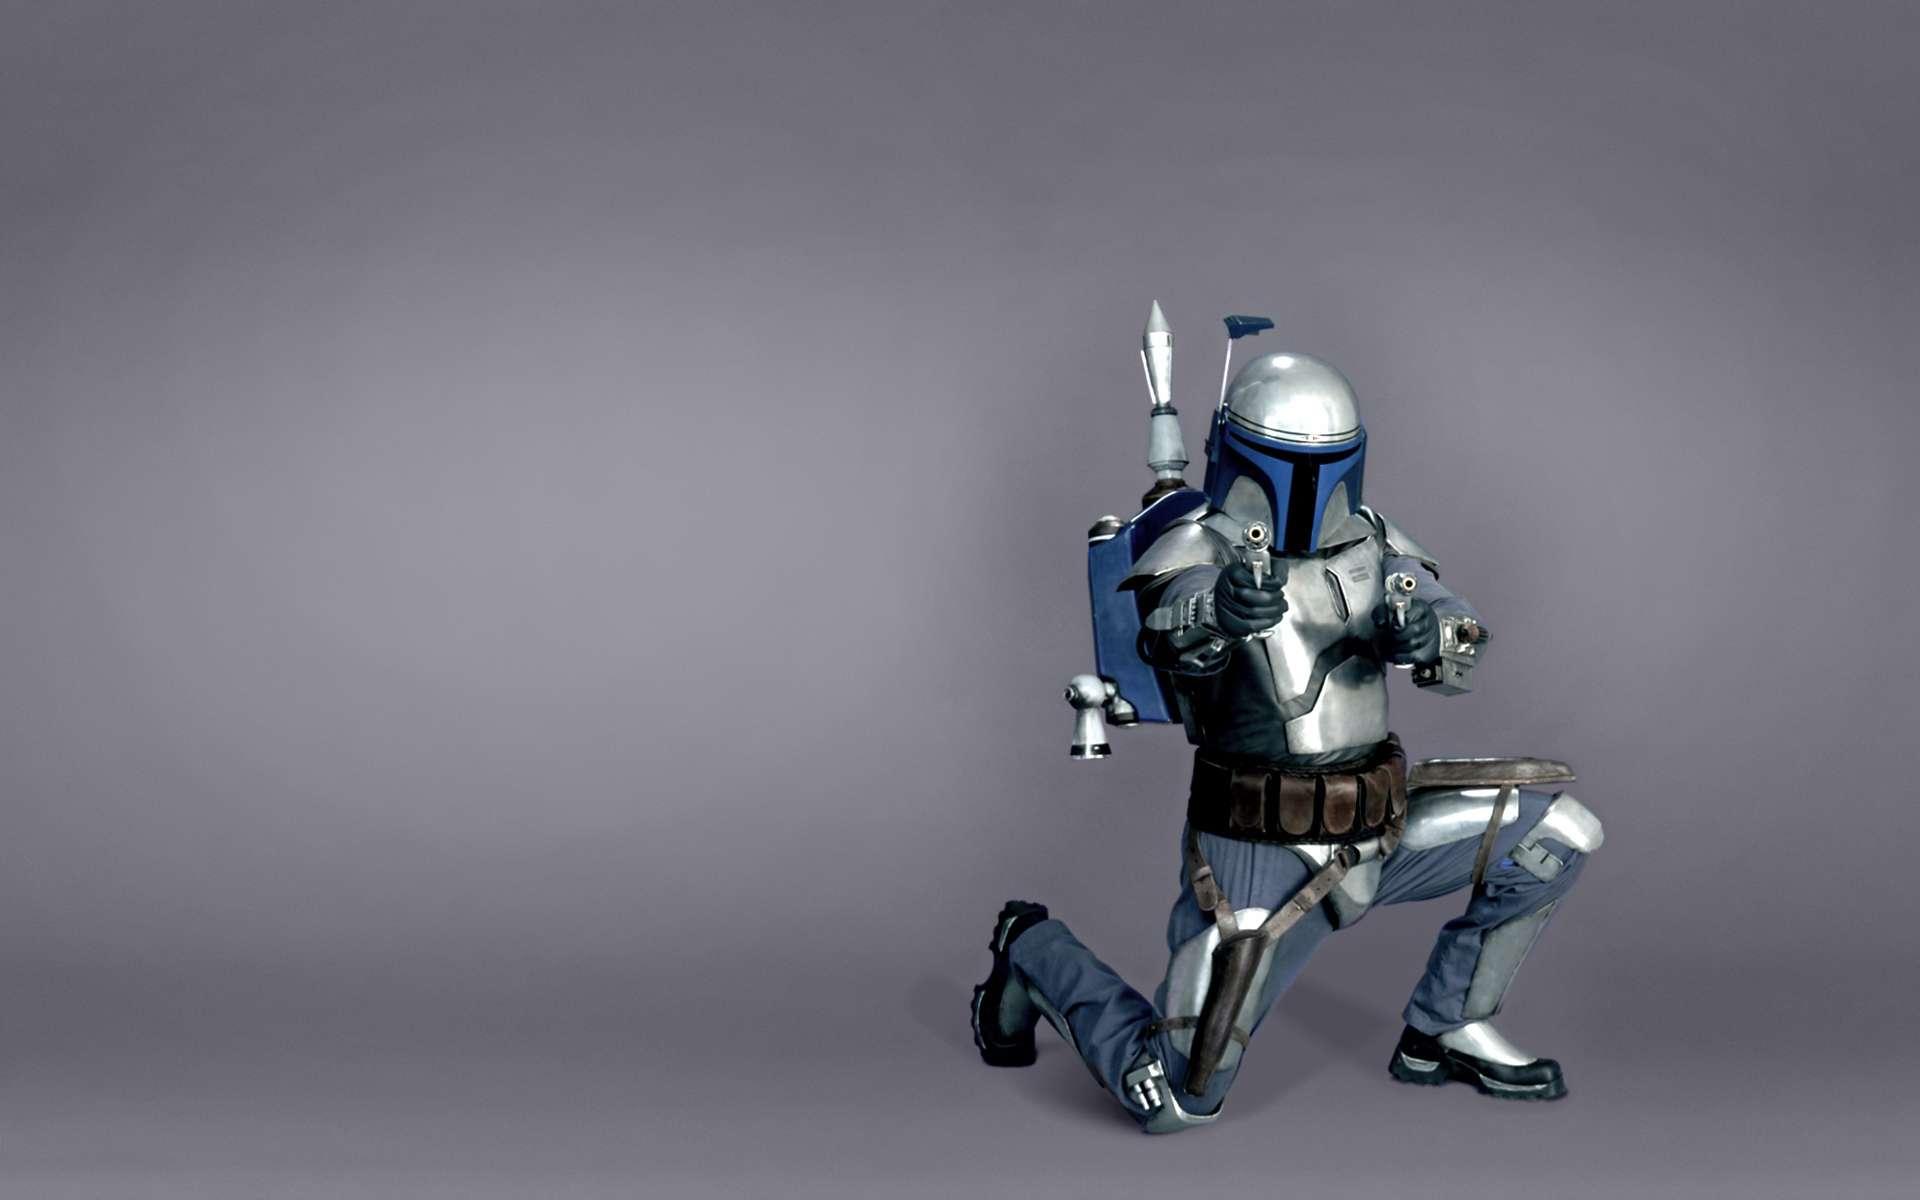 Star Wars Wallpaper 023